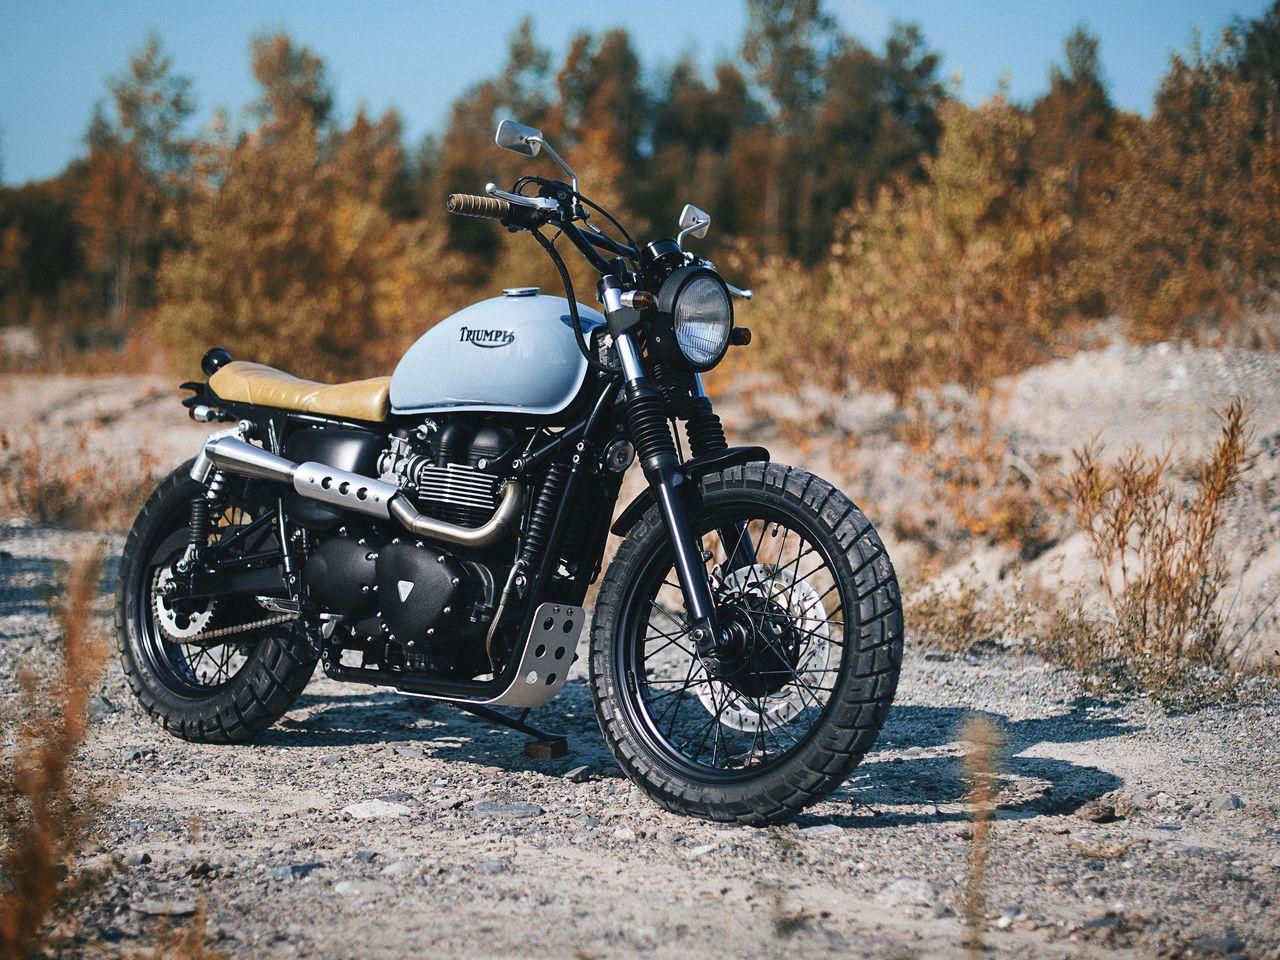 1280x960 Обои triumph, bonneville, мотоцикл, вид сбоку